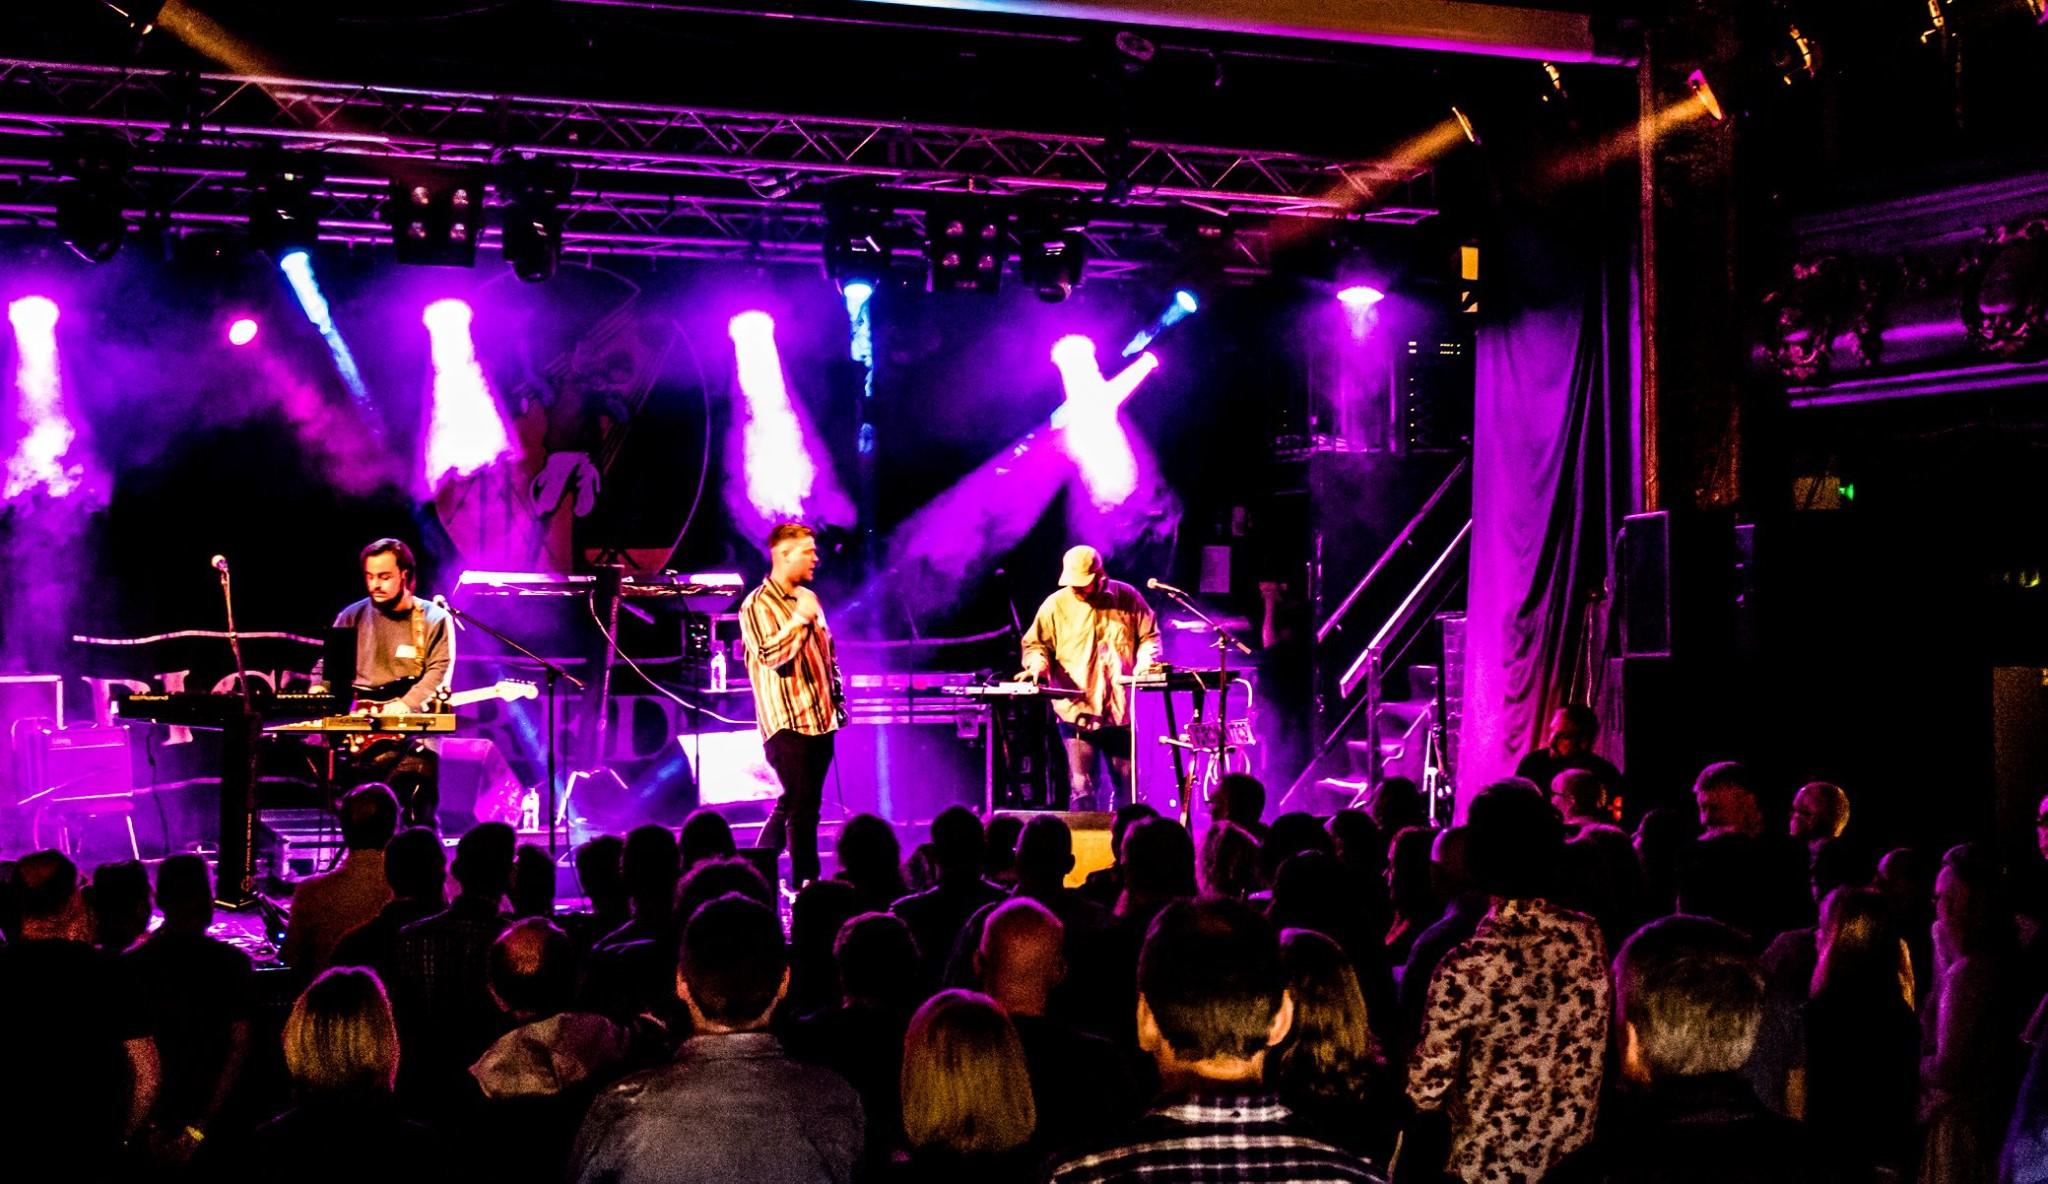 Vuromantics onstage at Holmfirth Picturedrome